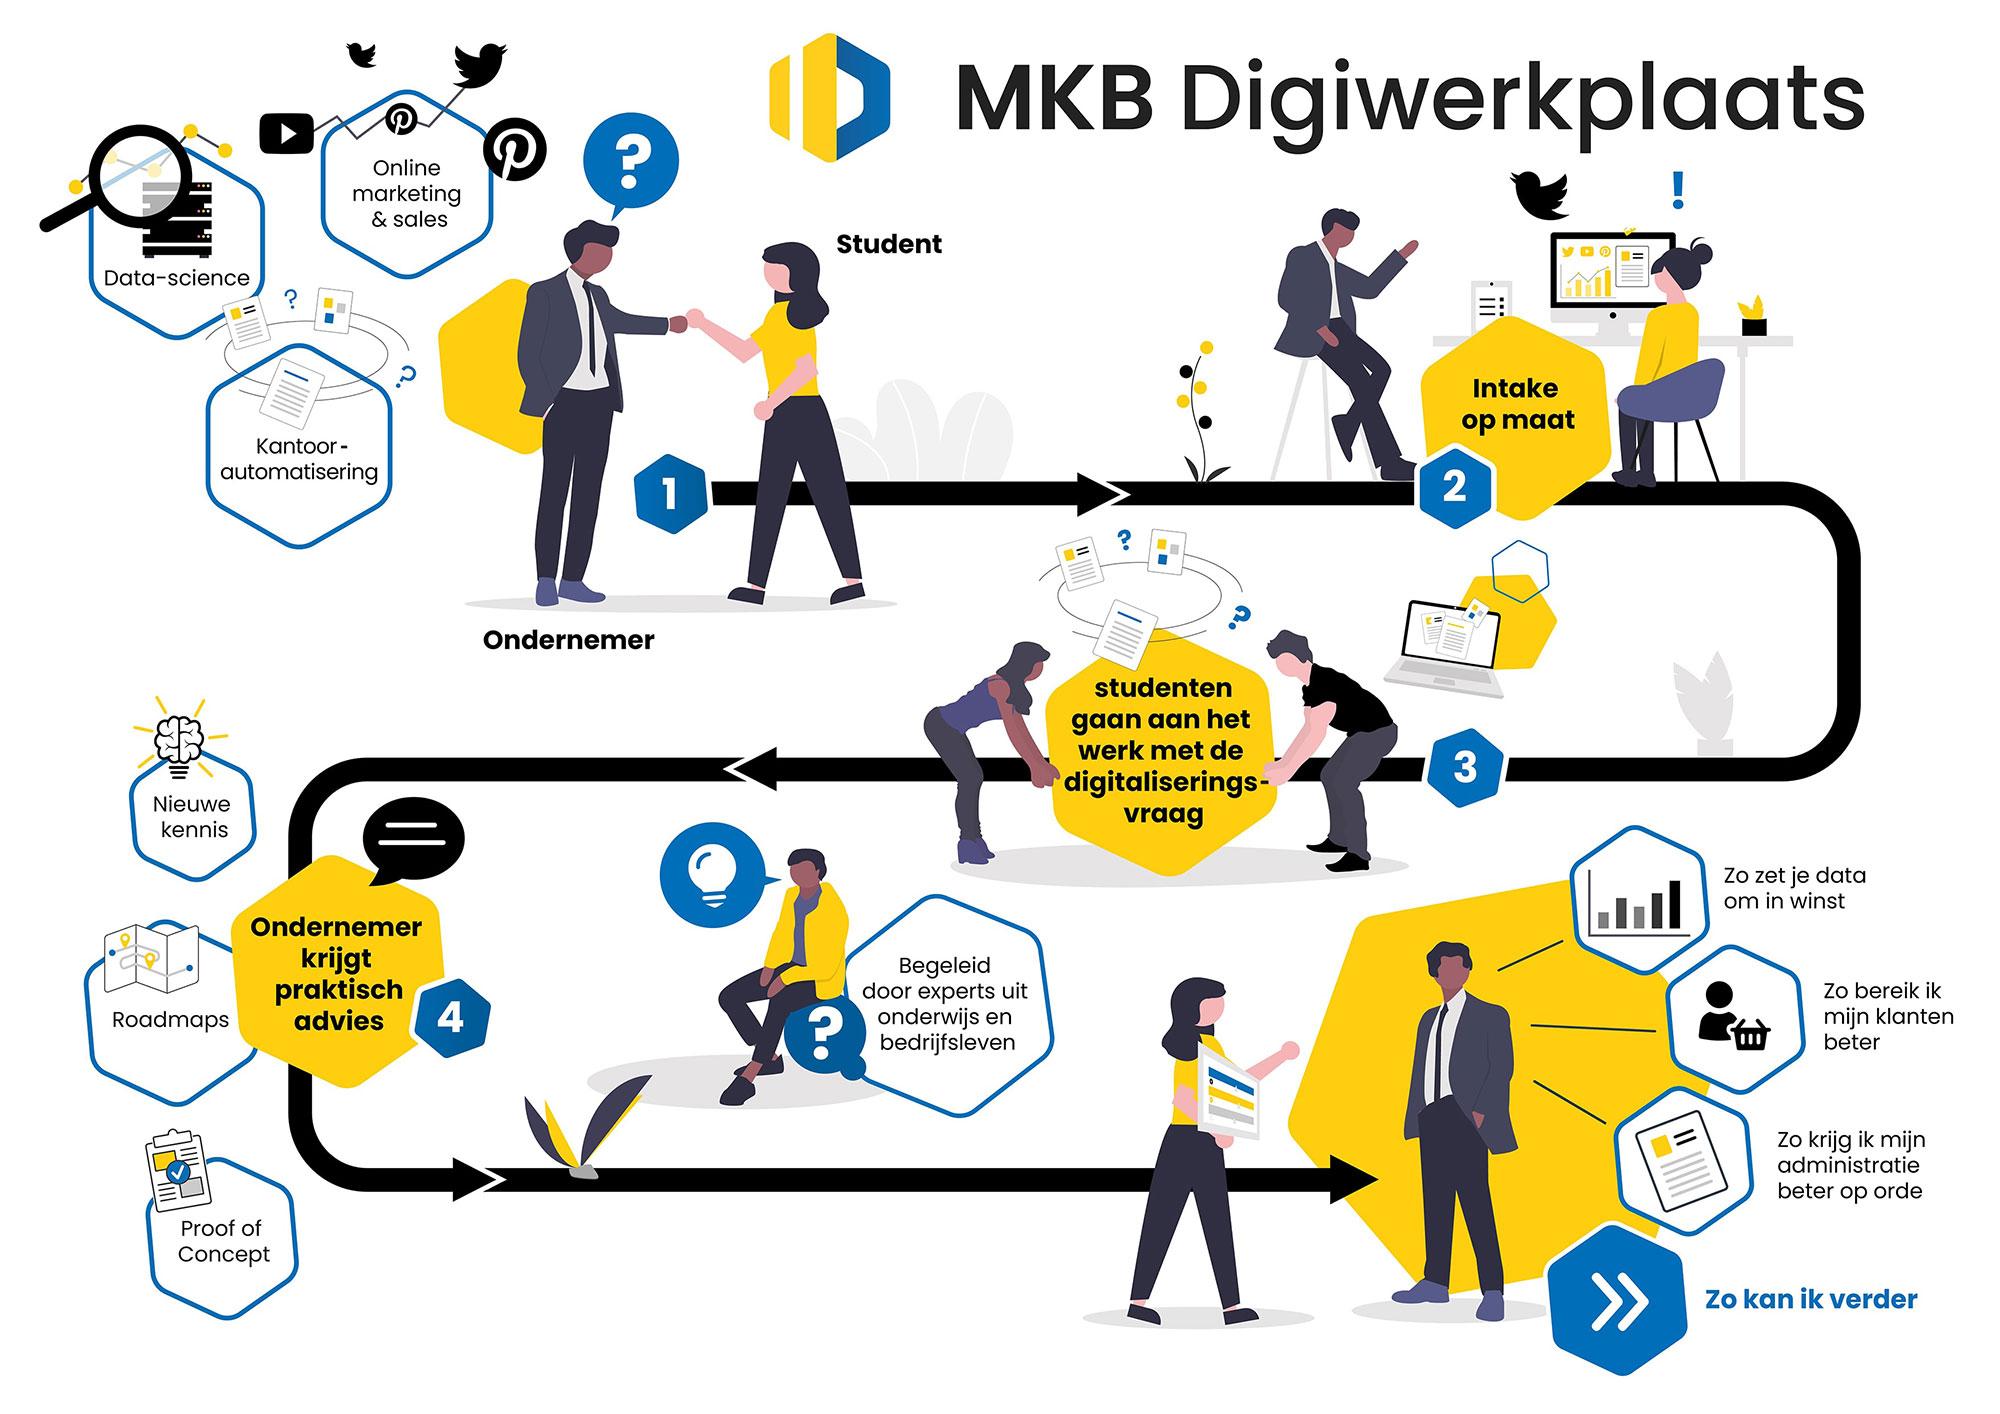 Infographic MKB Digiwerkplaats